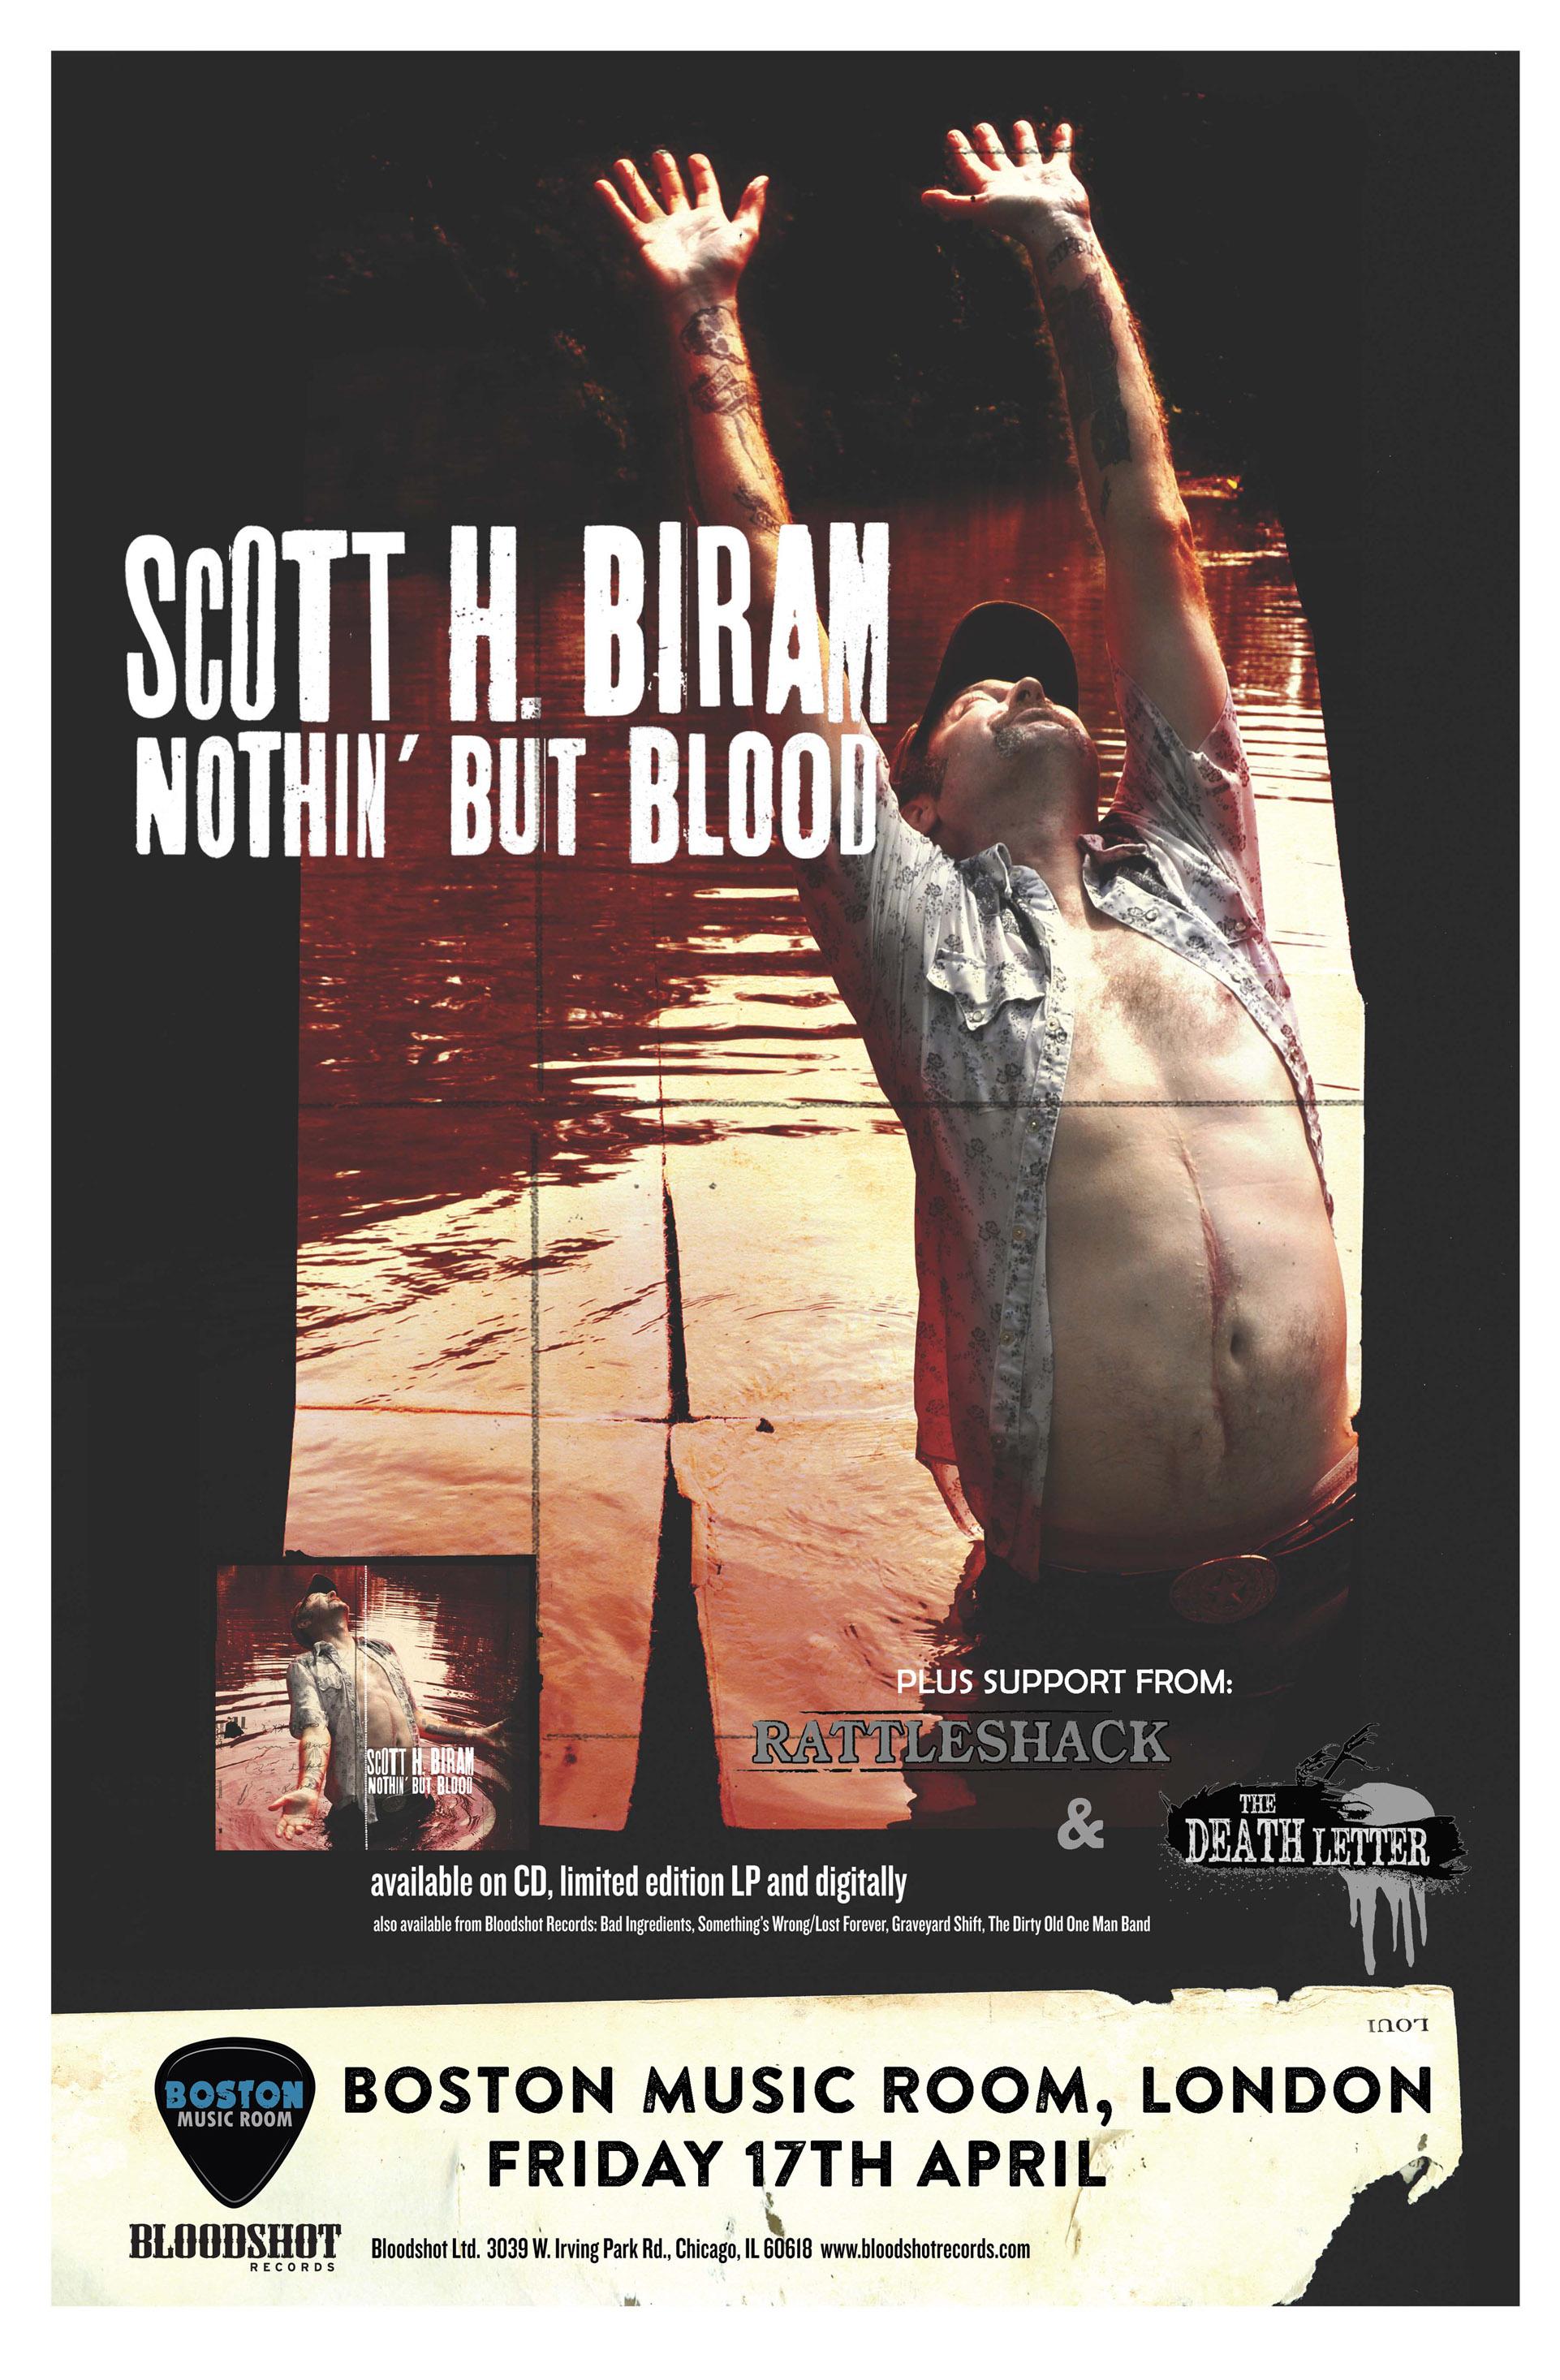 scott biram poster